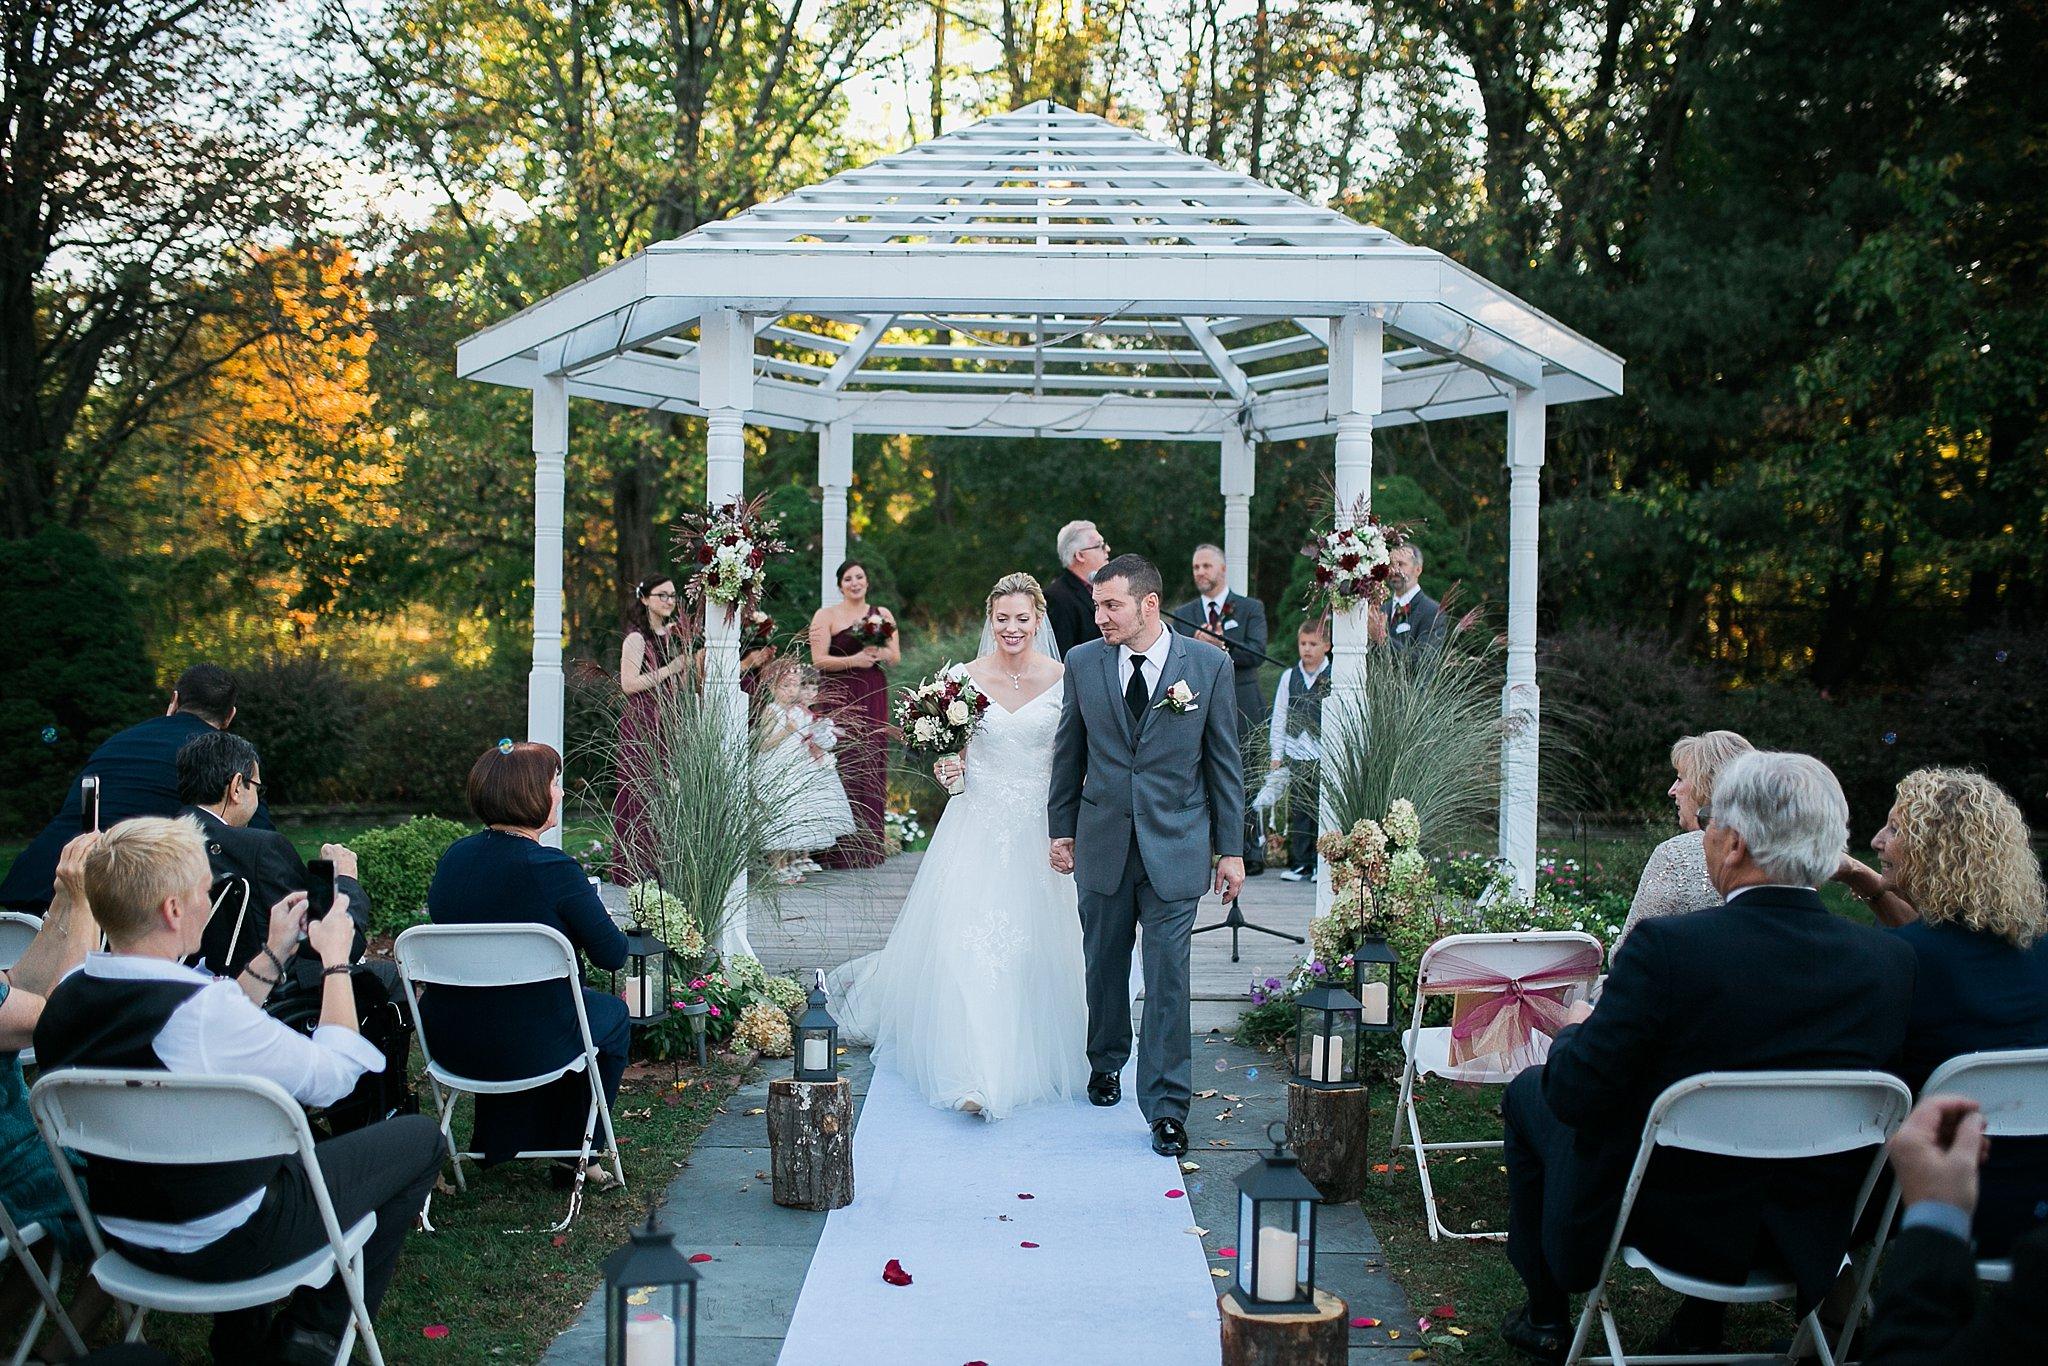 New Windsor New York Hudson Valley New York Wedding Photographer 48.jpg